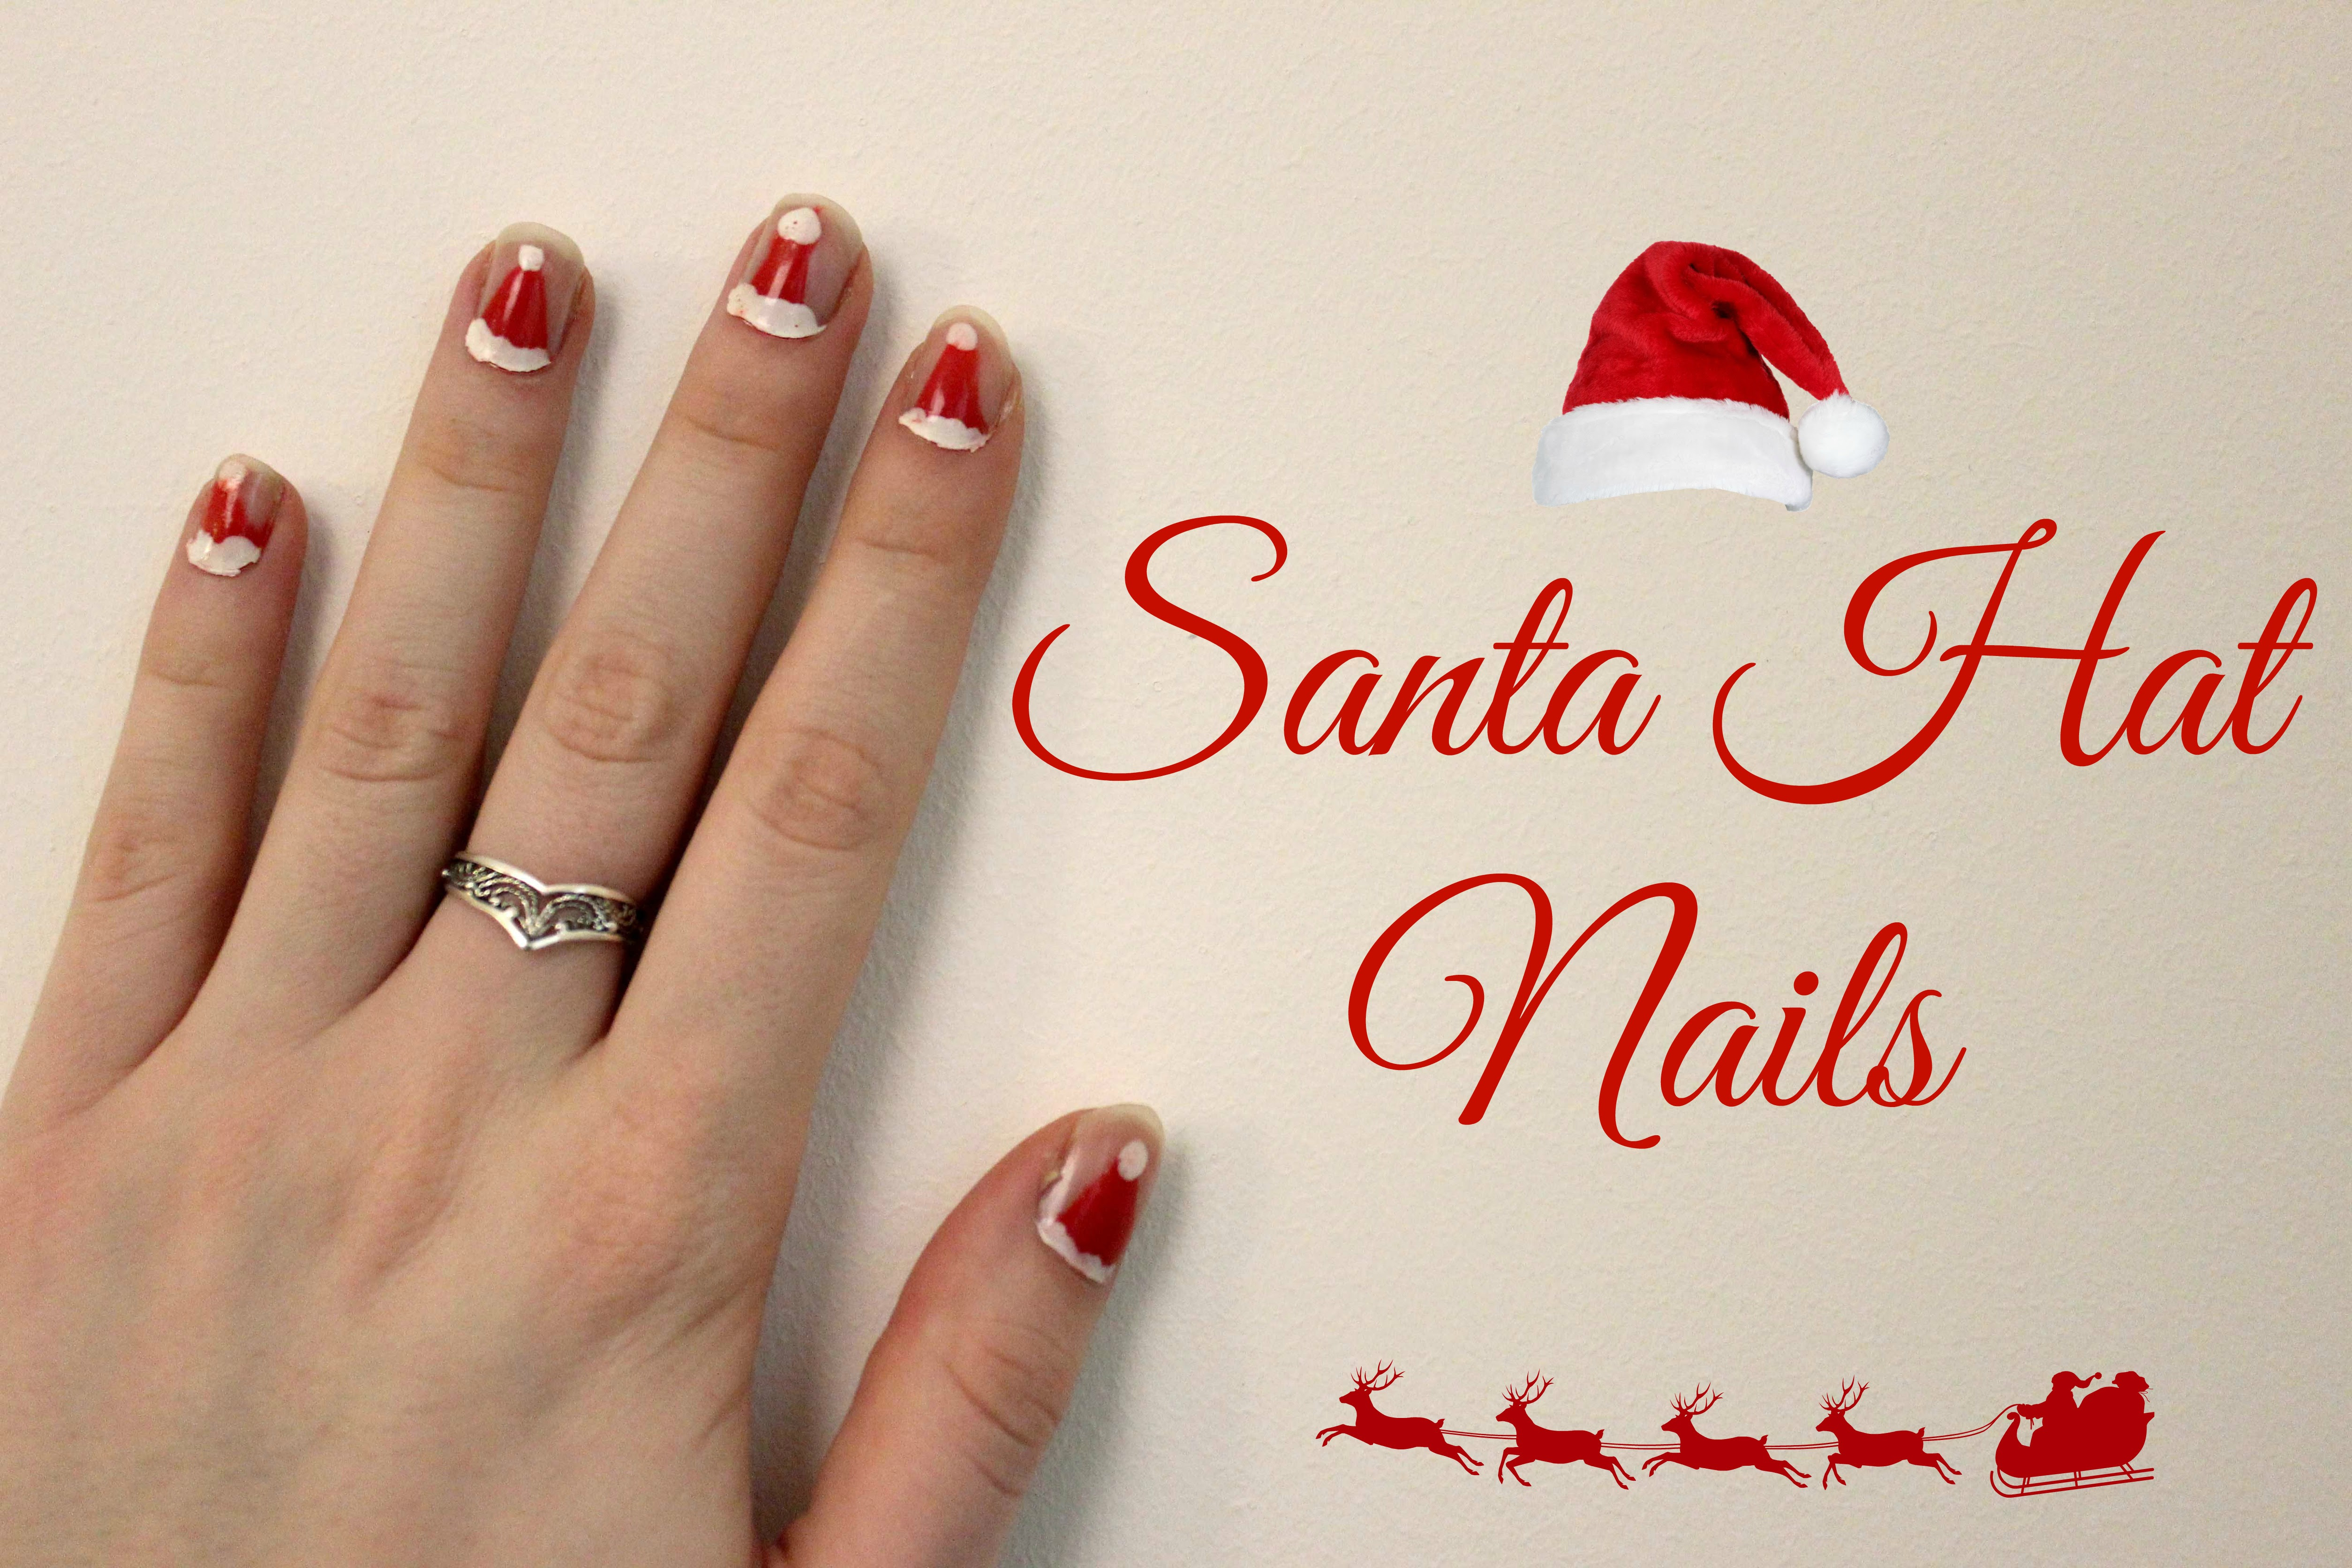 Santa hat nail art design